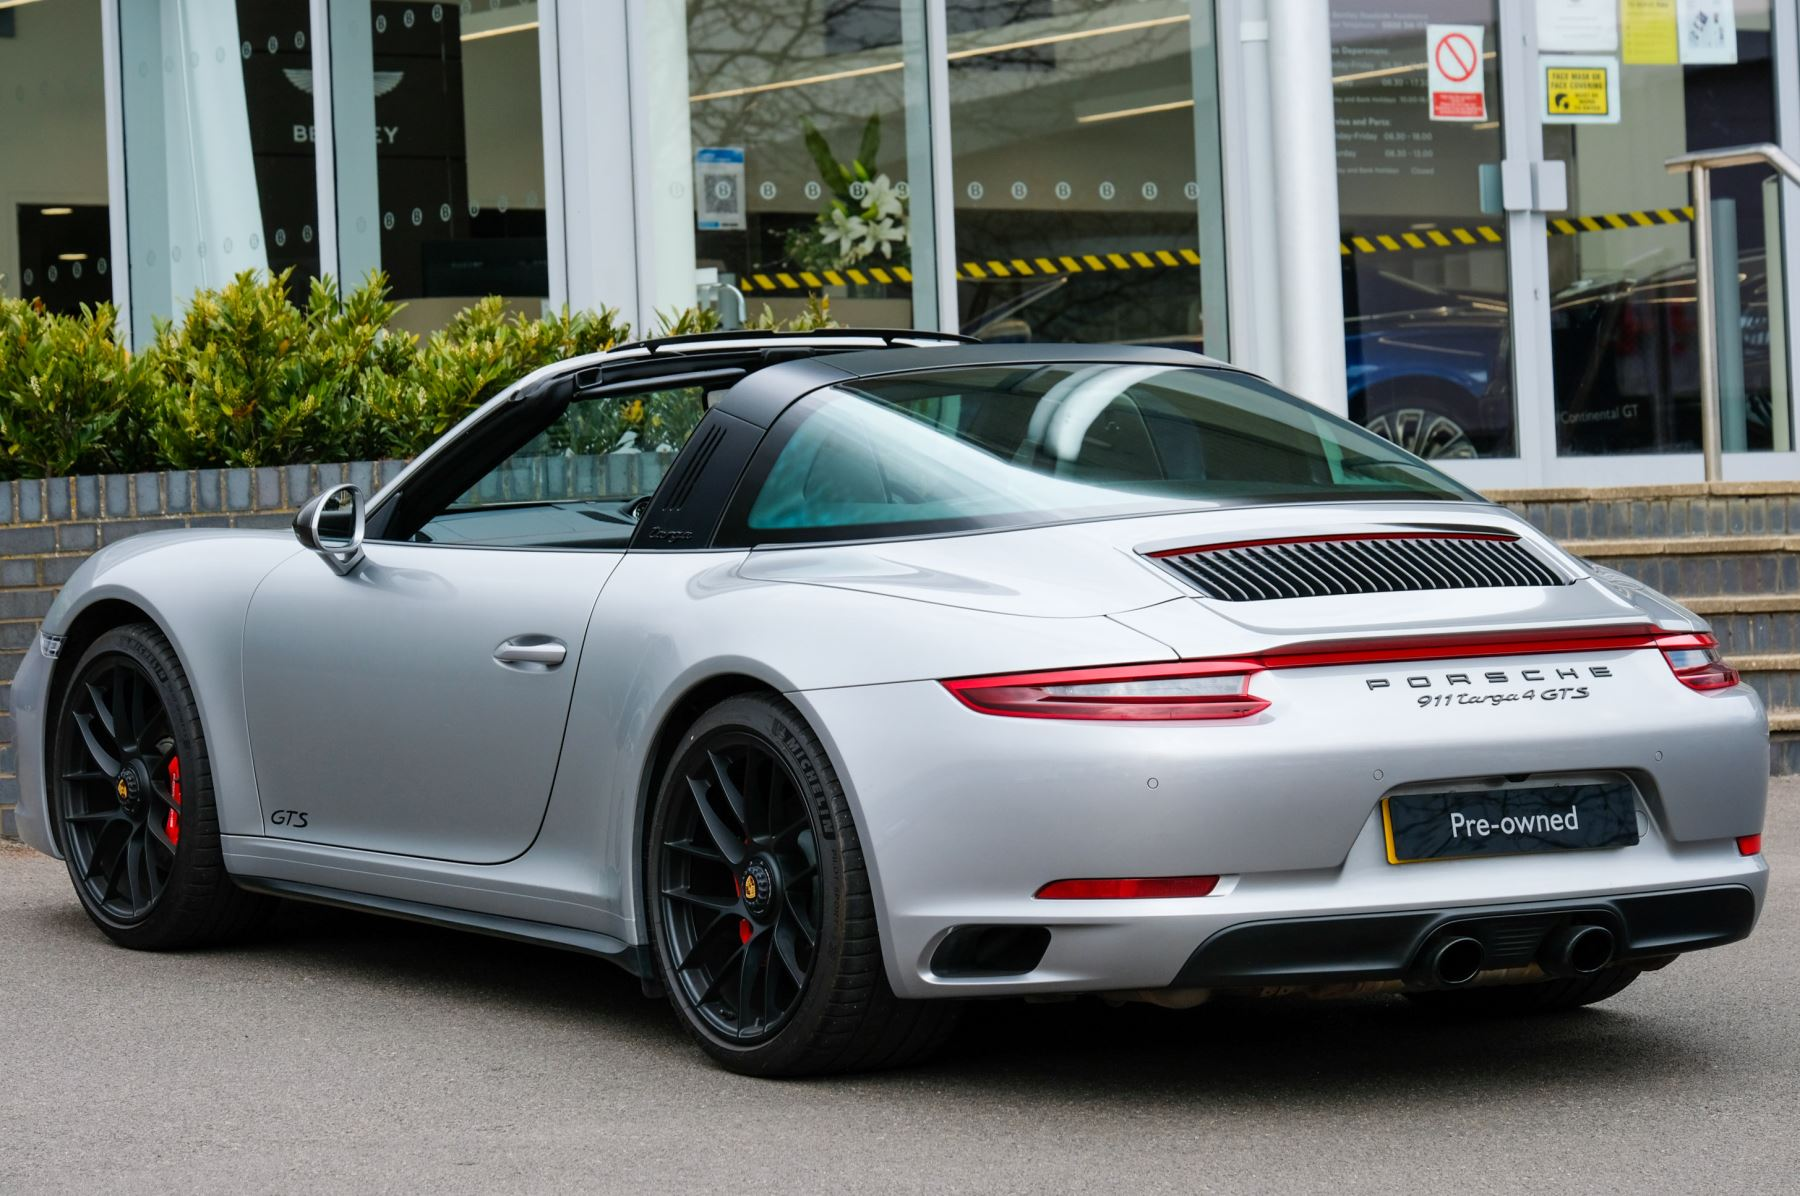 Porsche 911 TARGA 4 GTS - PDK - SPORT DESIGN PACKAGE - GTS INTERIOR PACKAGE image 2